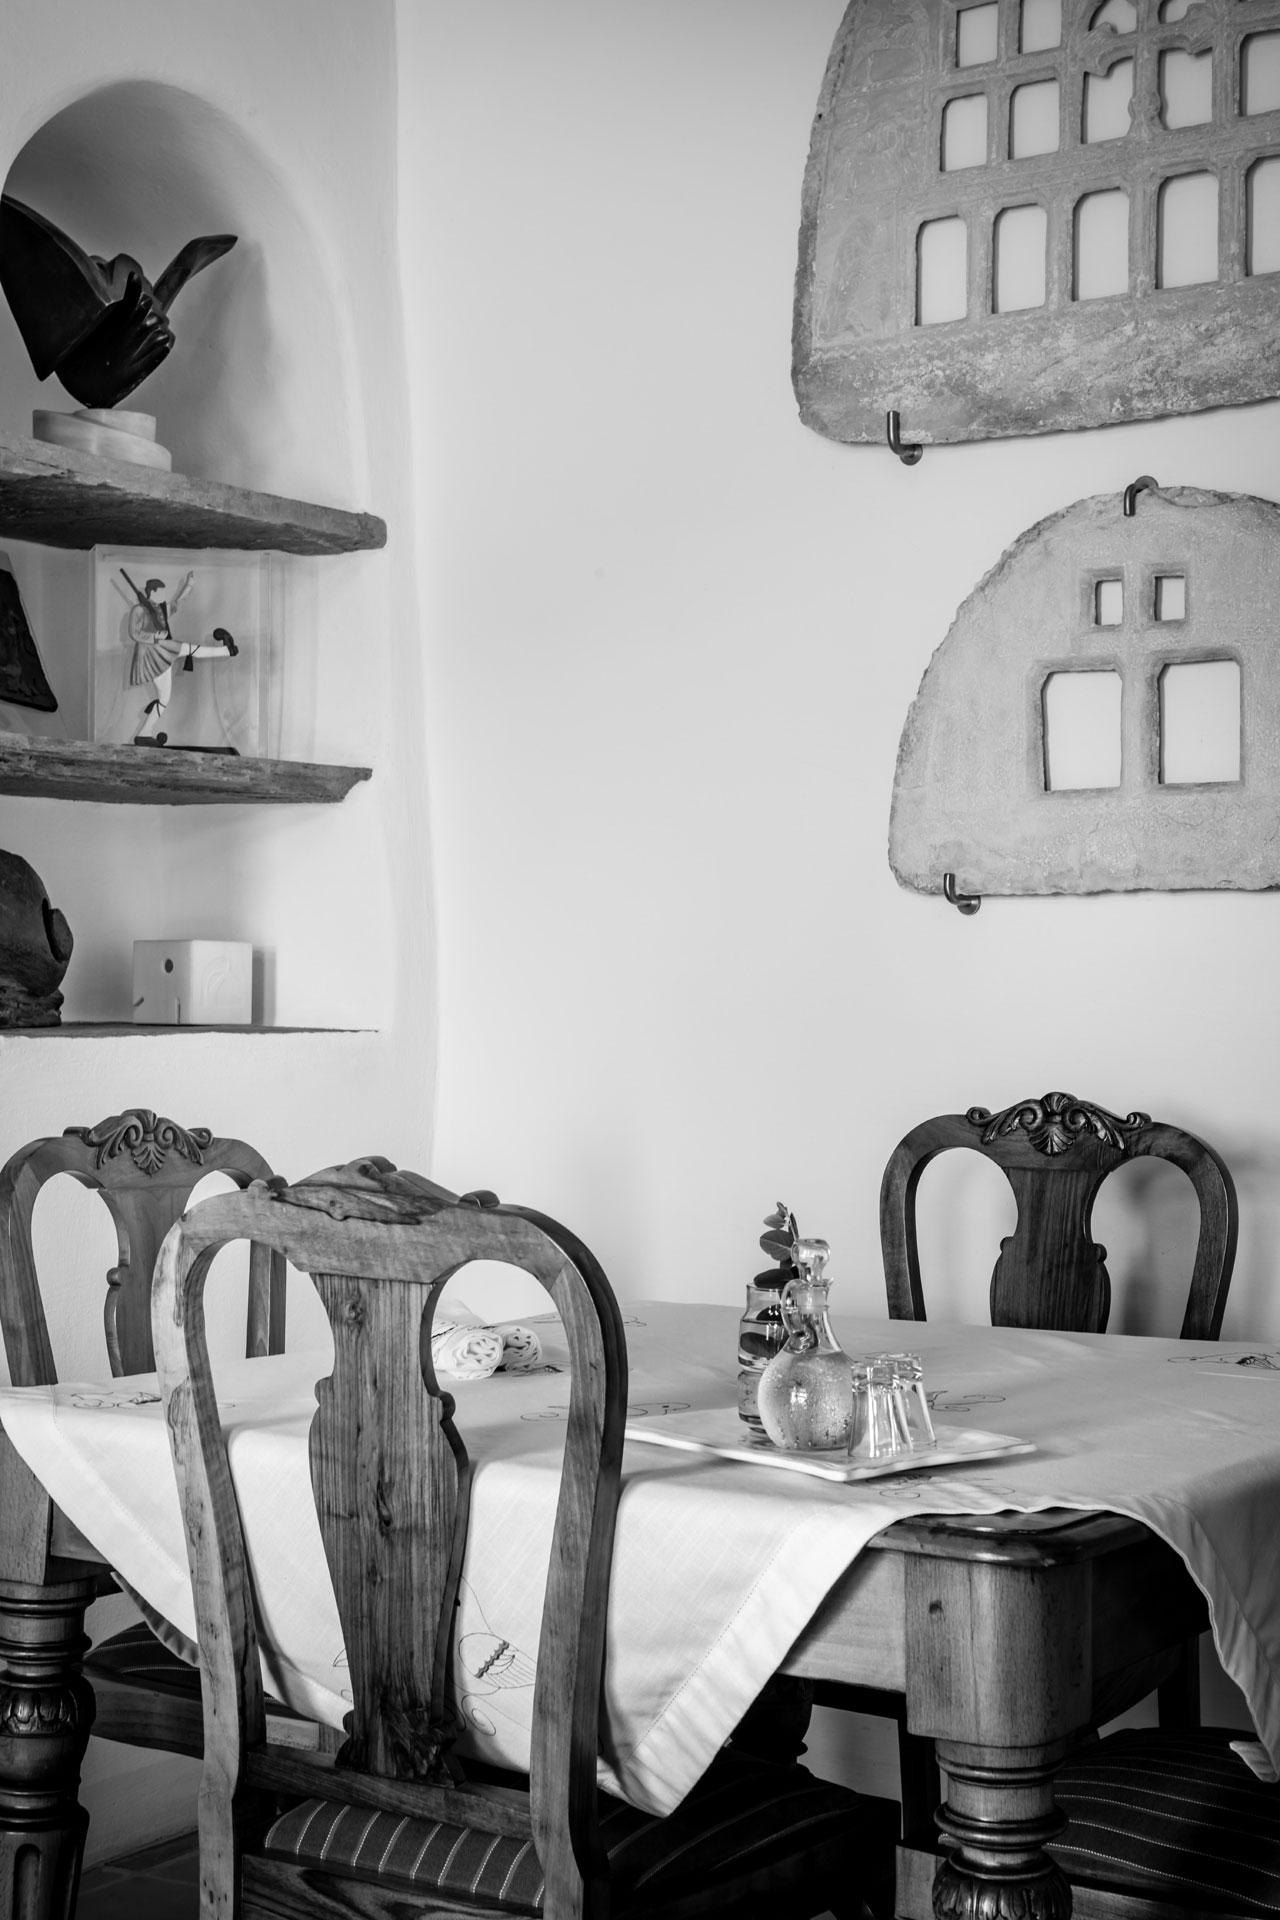 Photo by Elias Joidos © Yatzerland Ltd.Crossroads Inn Hotel, Tripotamos, Tinos, Greece.